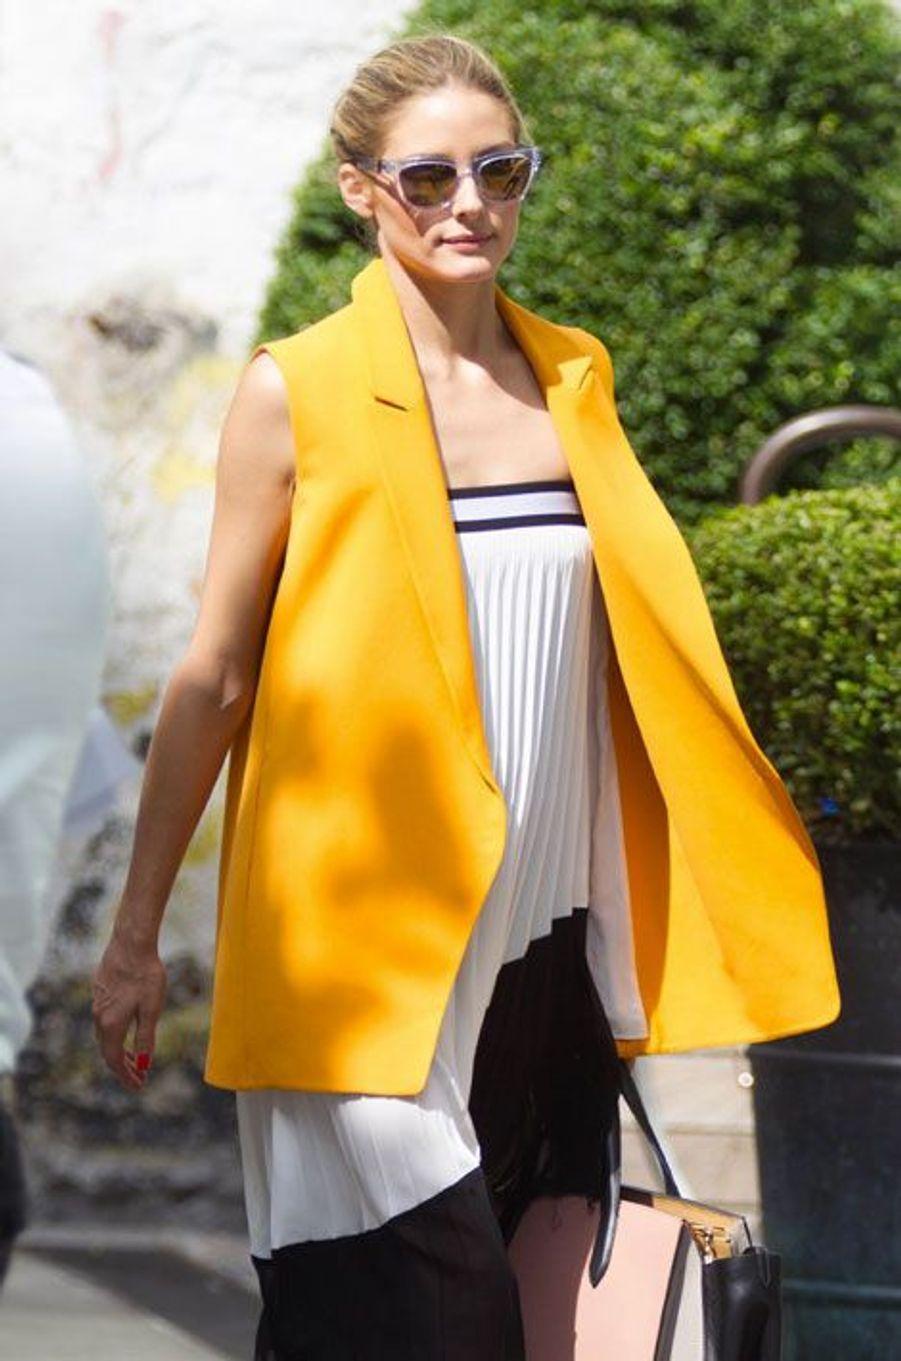 La styliste Olivia Palermo à New York le 18 juin 2014